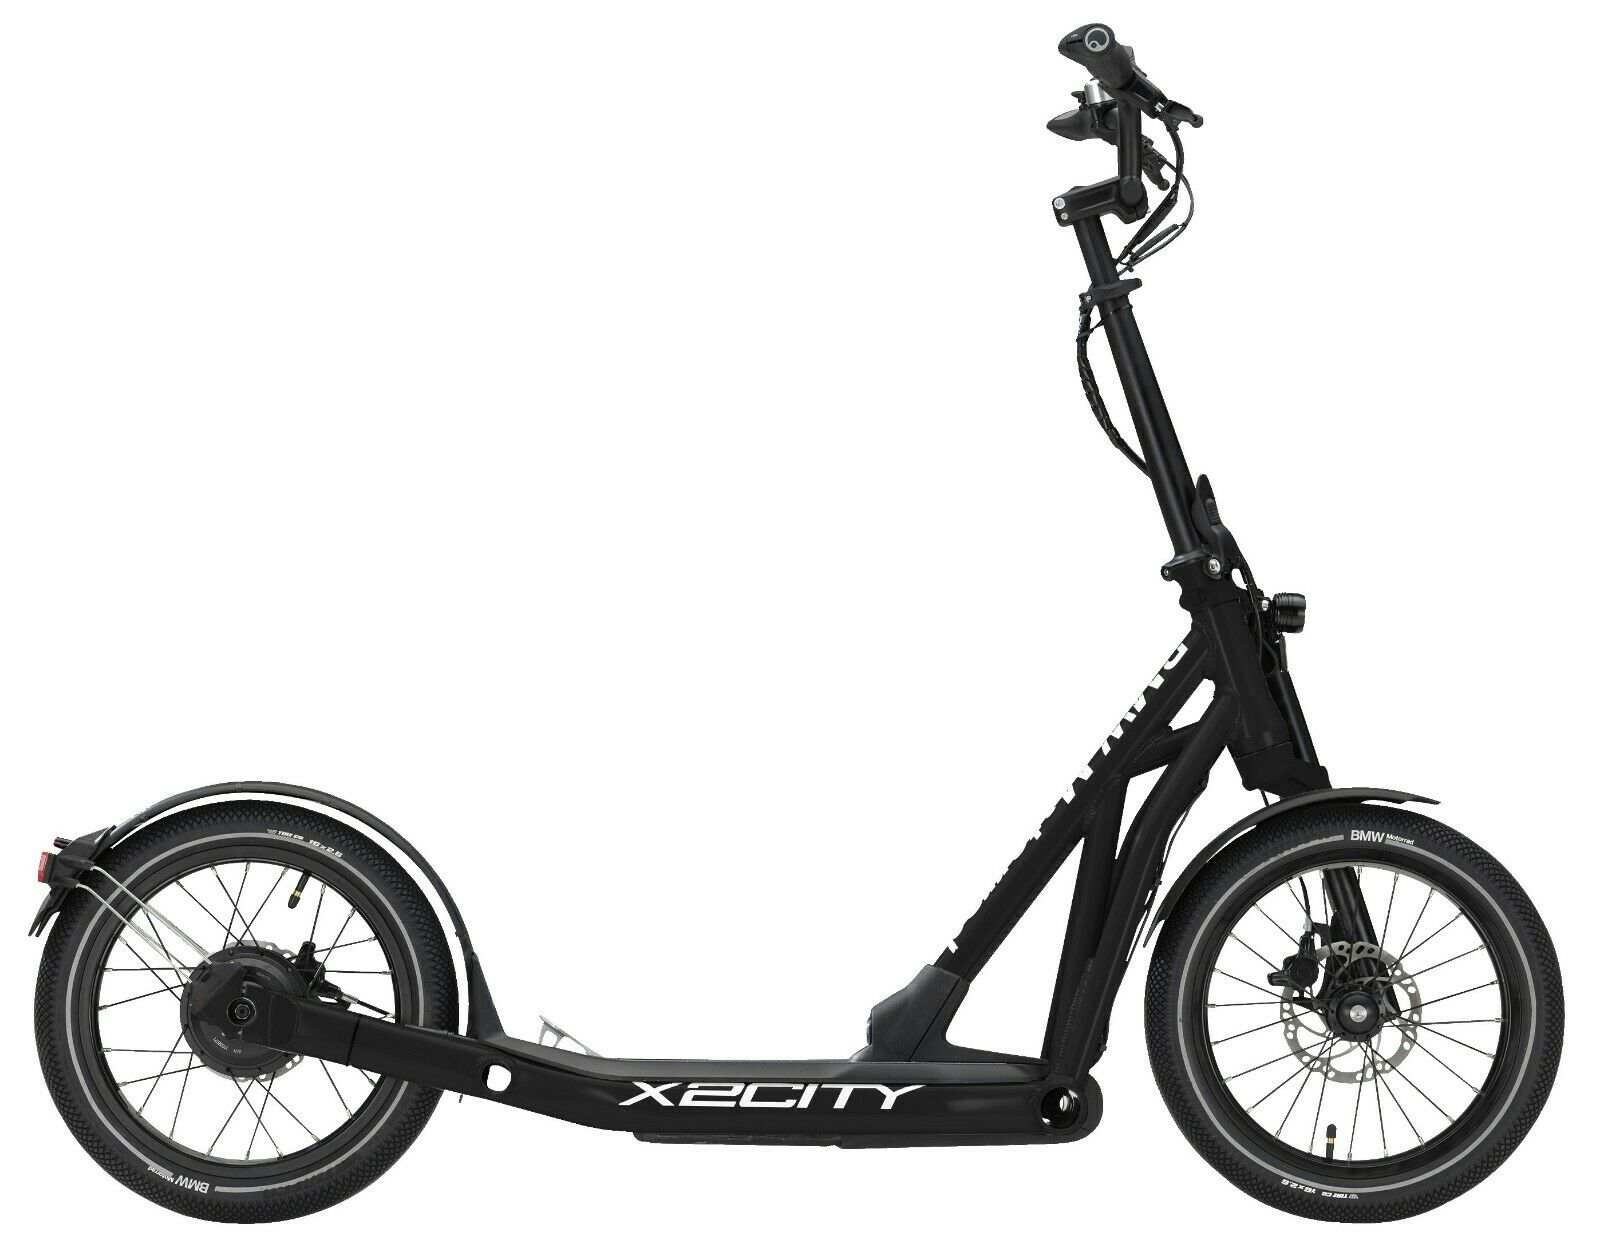 Original BMW X2 Elektro Cityroller E-Scooter BMW Motorrad Roller X2City Kettler